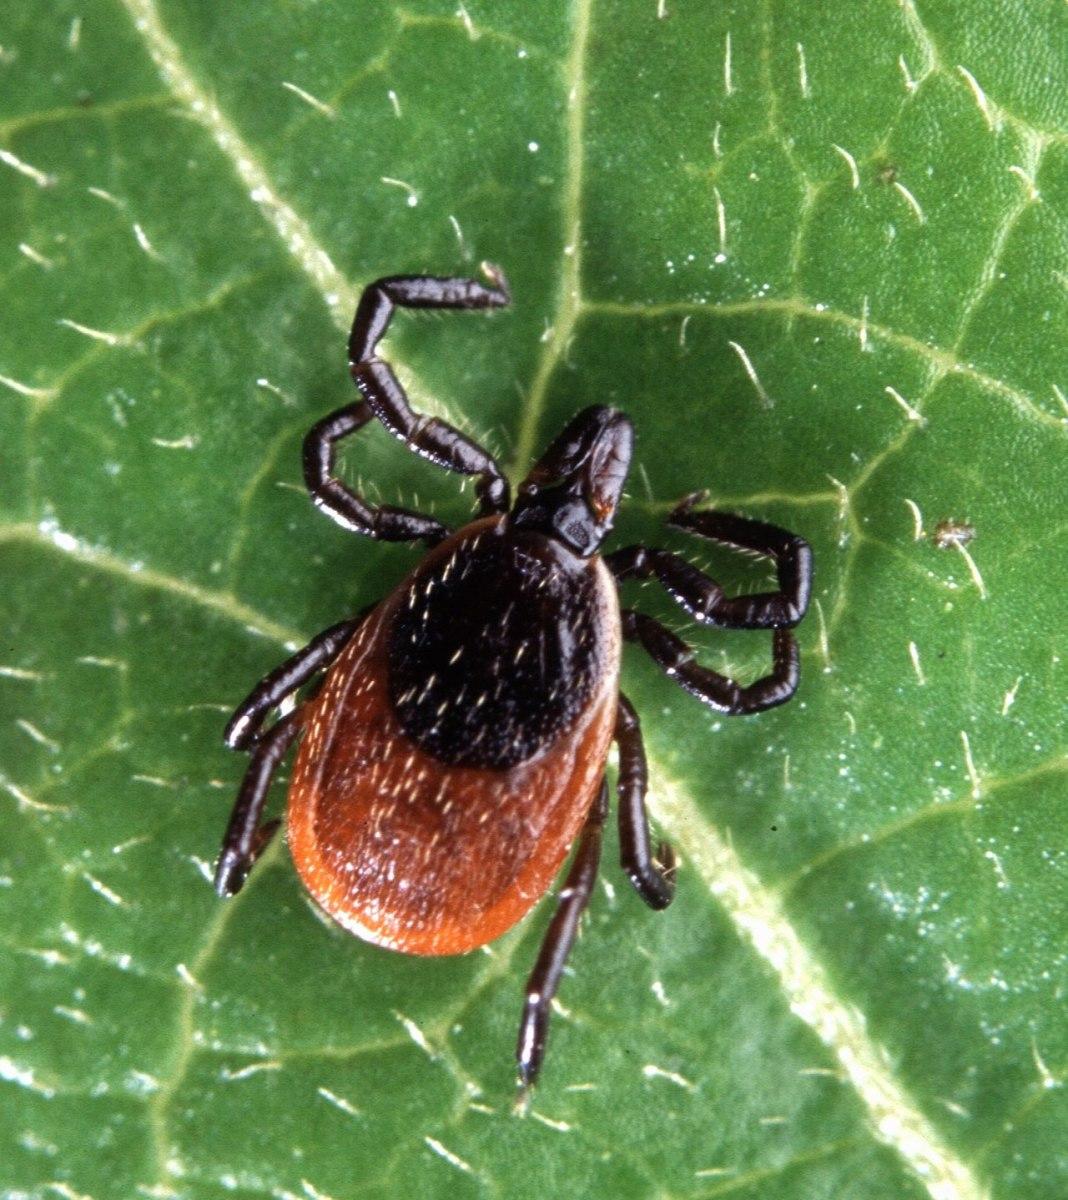 The black-legged tick or deer tick transmits Lyme disease.